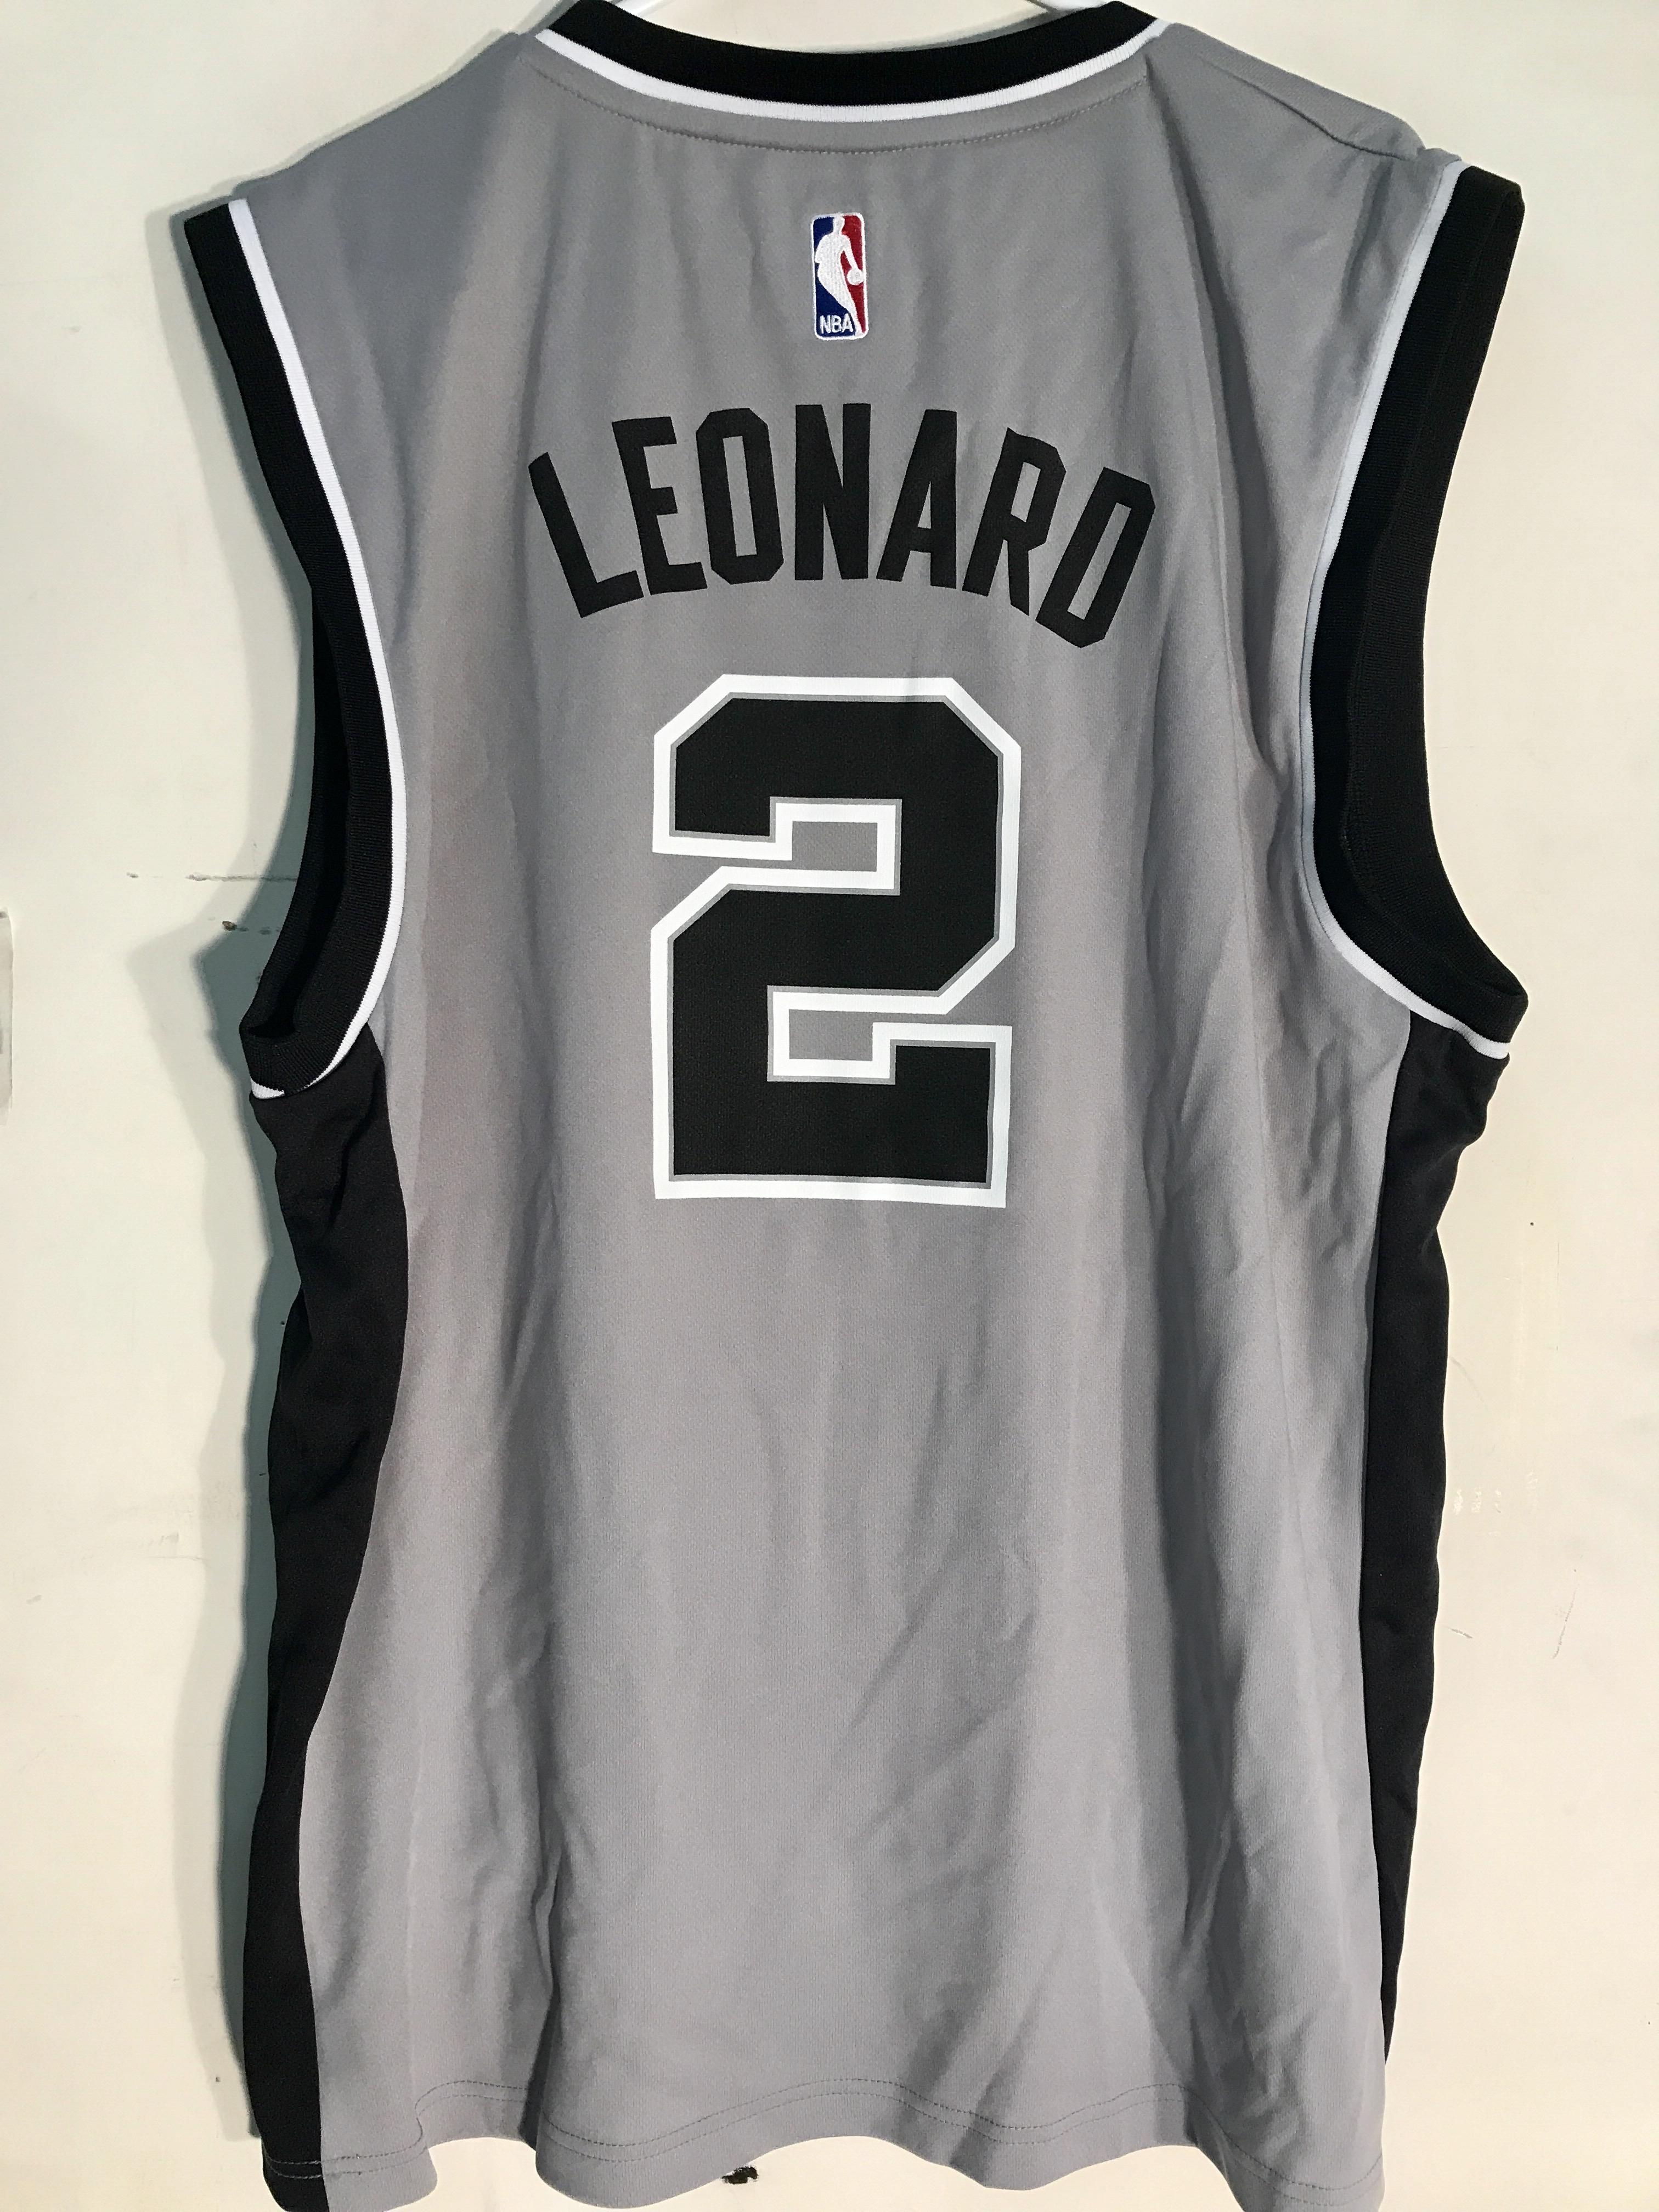 new concept 039f2 f1bdd Details about Adidas NBA Jersey San Antonio Spurs Kawhi Leonard Grey sz L